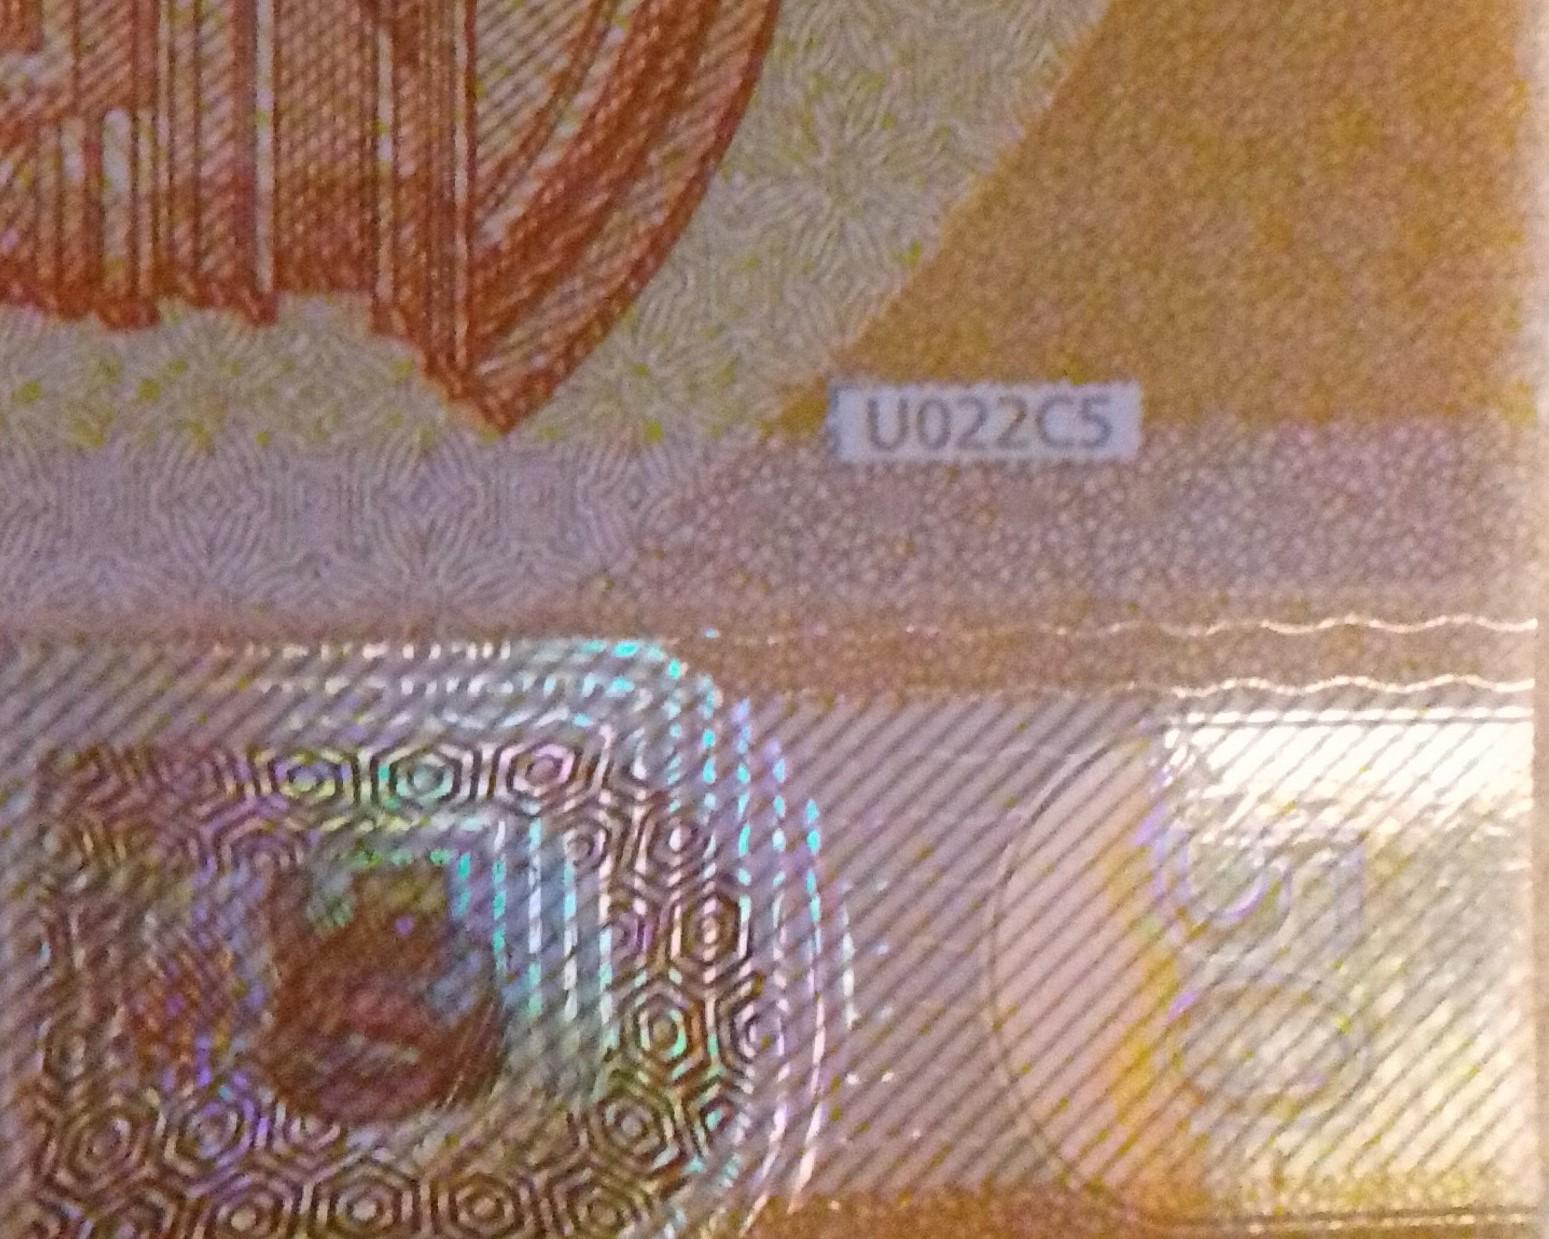 50 U U 022 Draghi Collection EUROPE